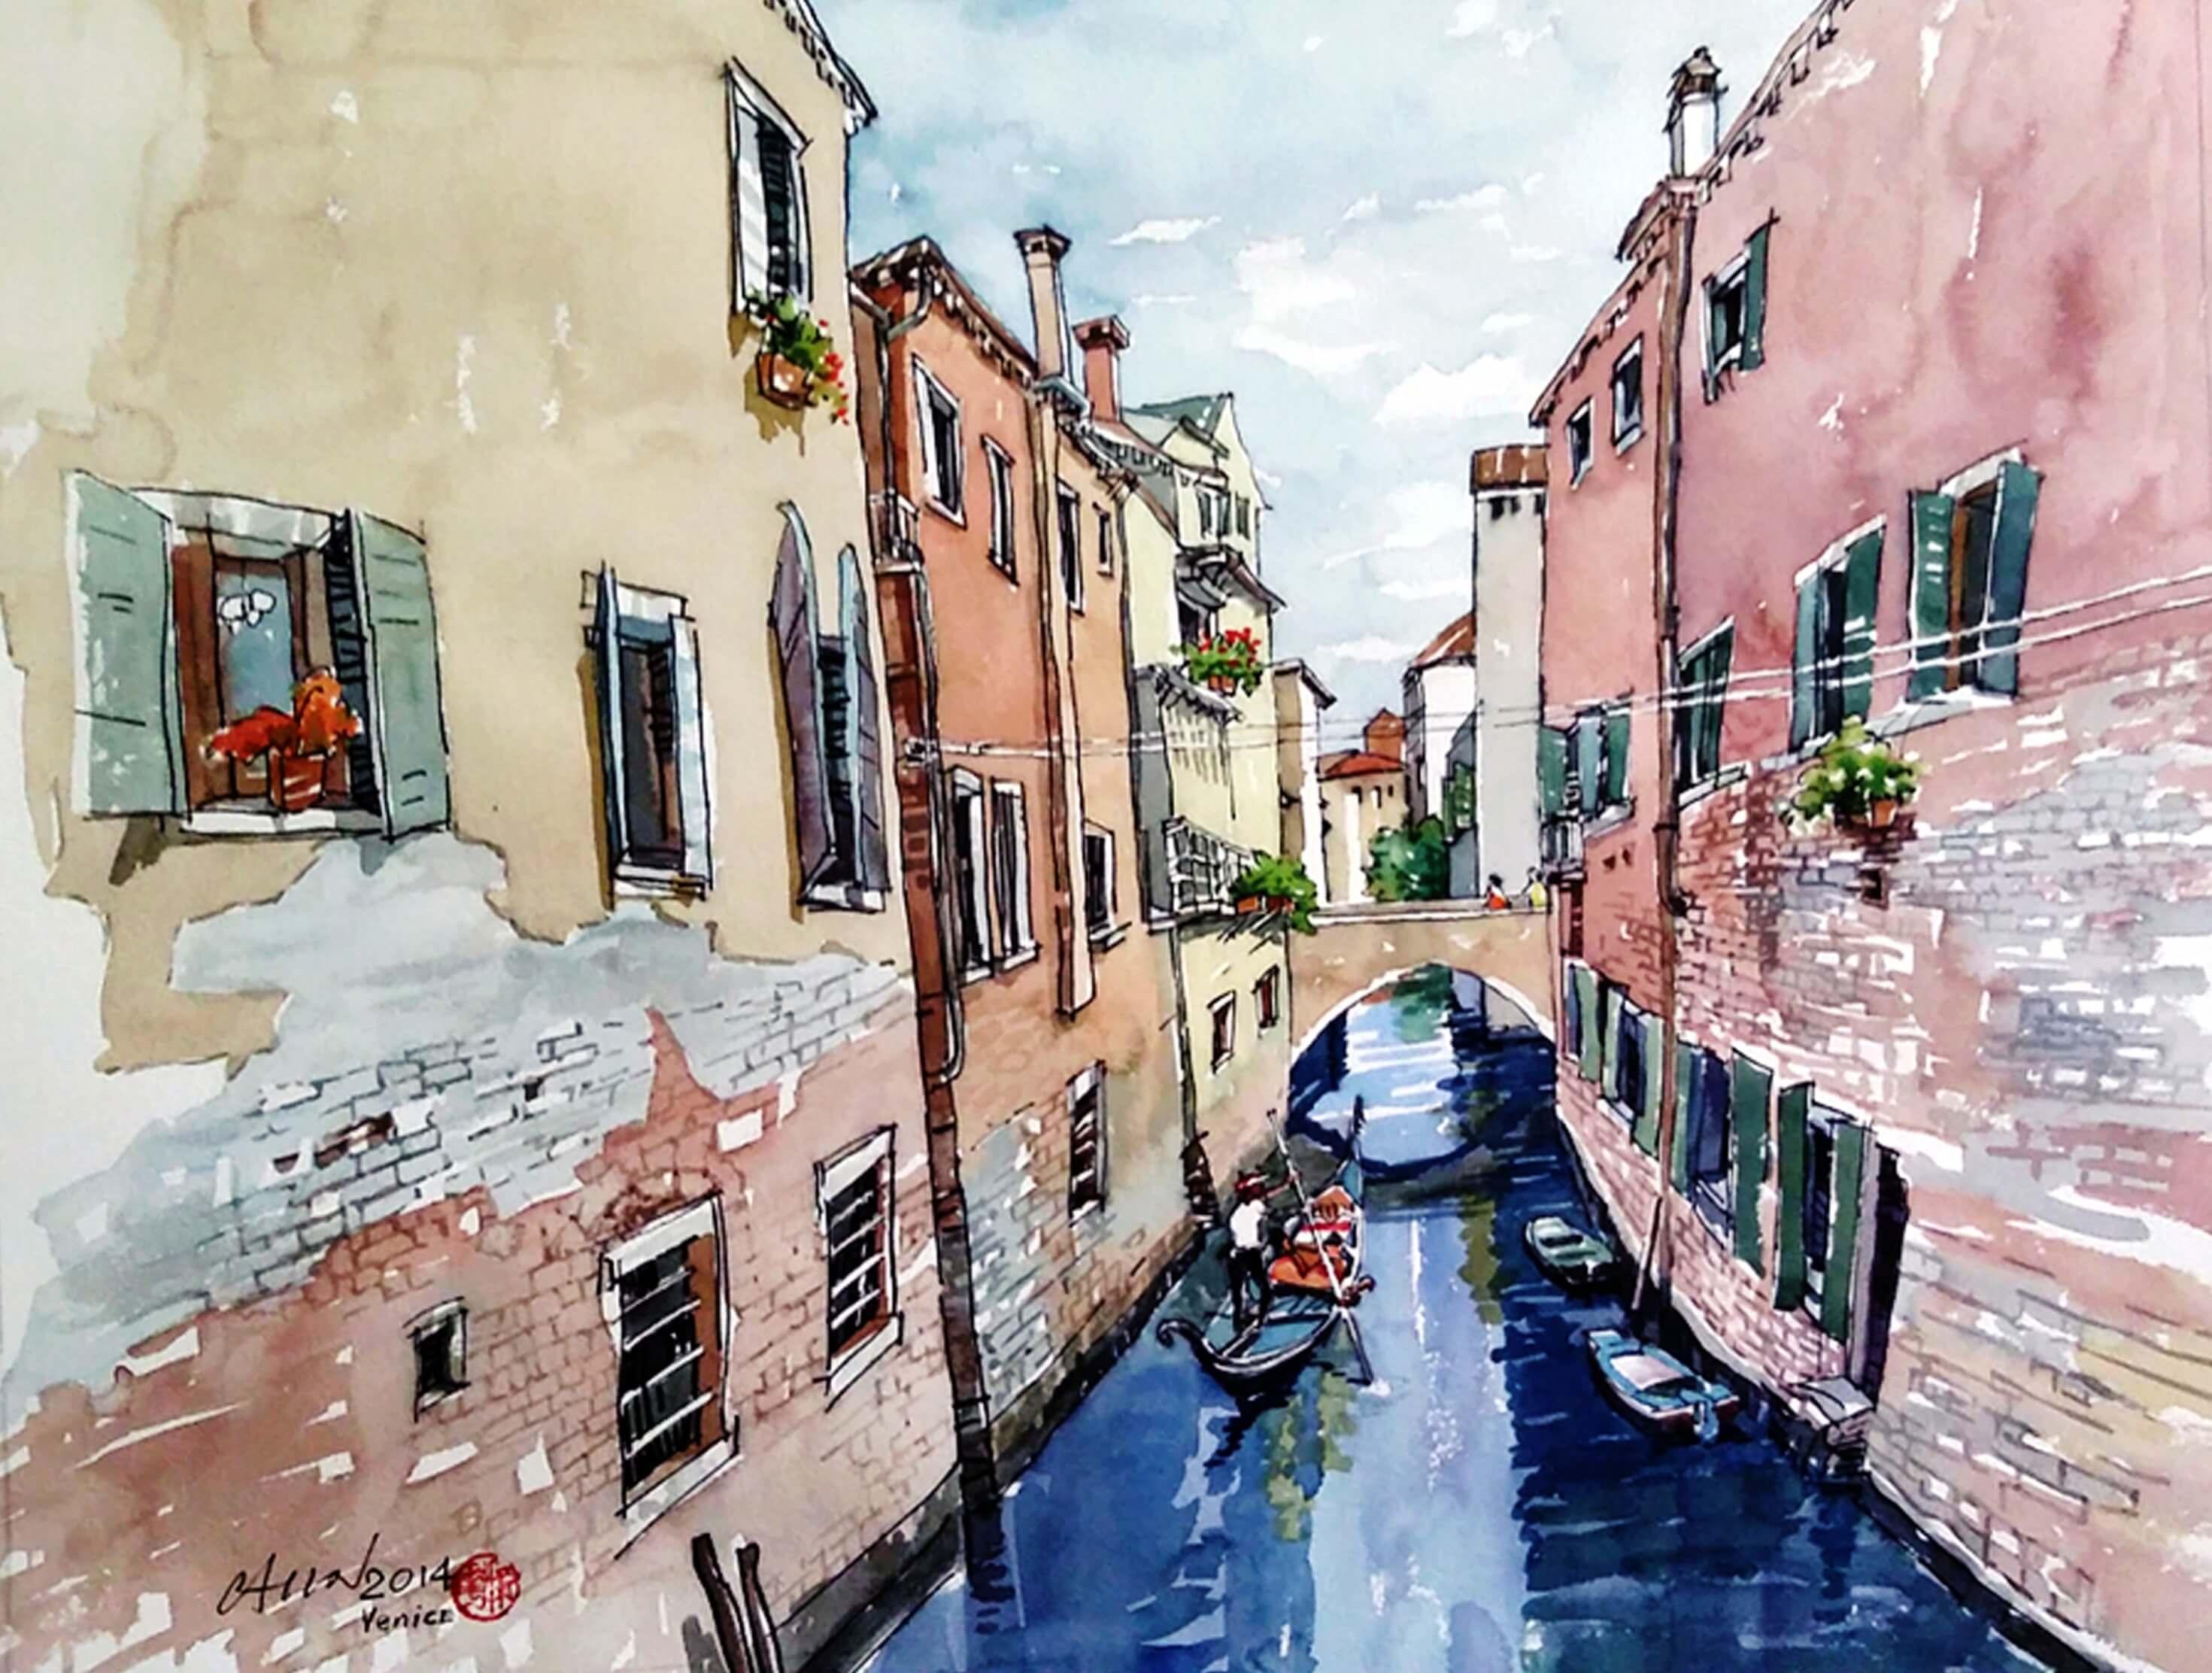 Venice – 2014 (63 cm x 48 cm)